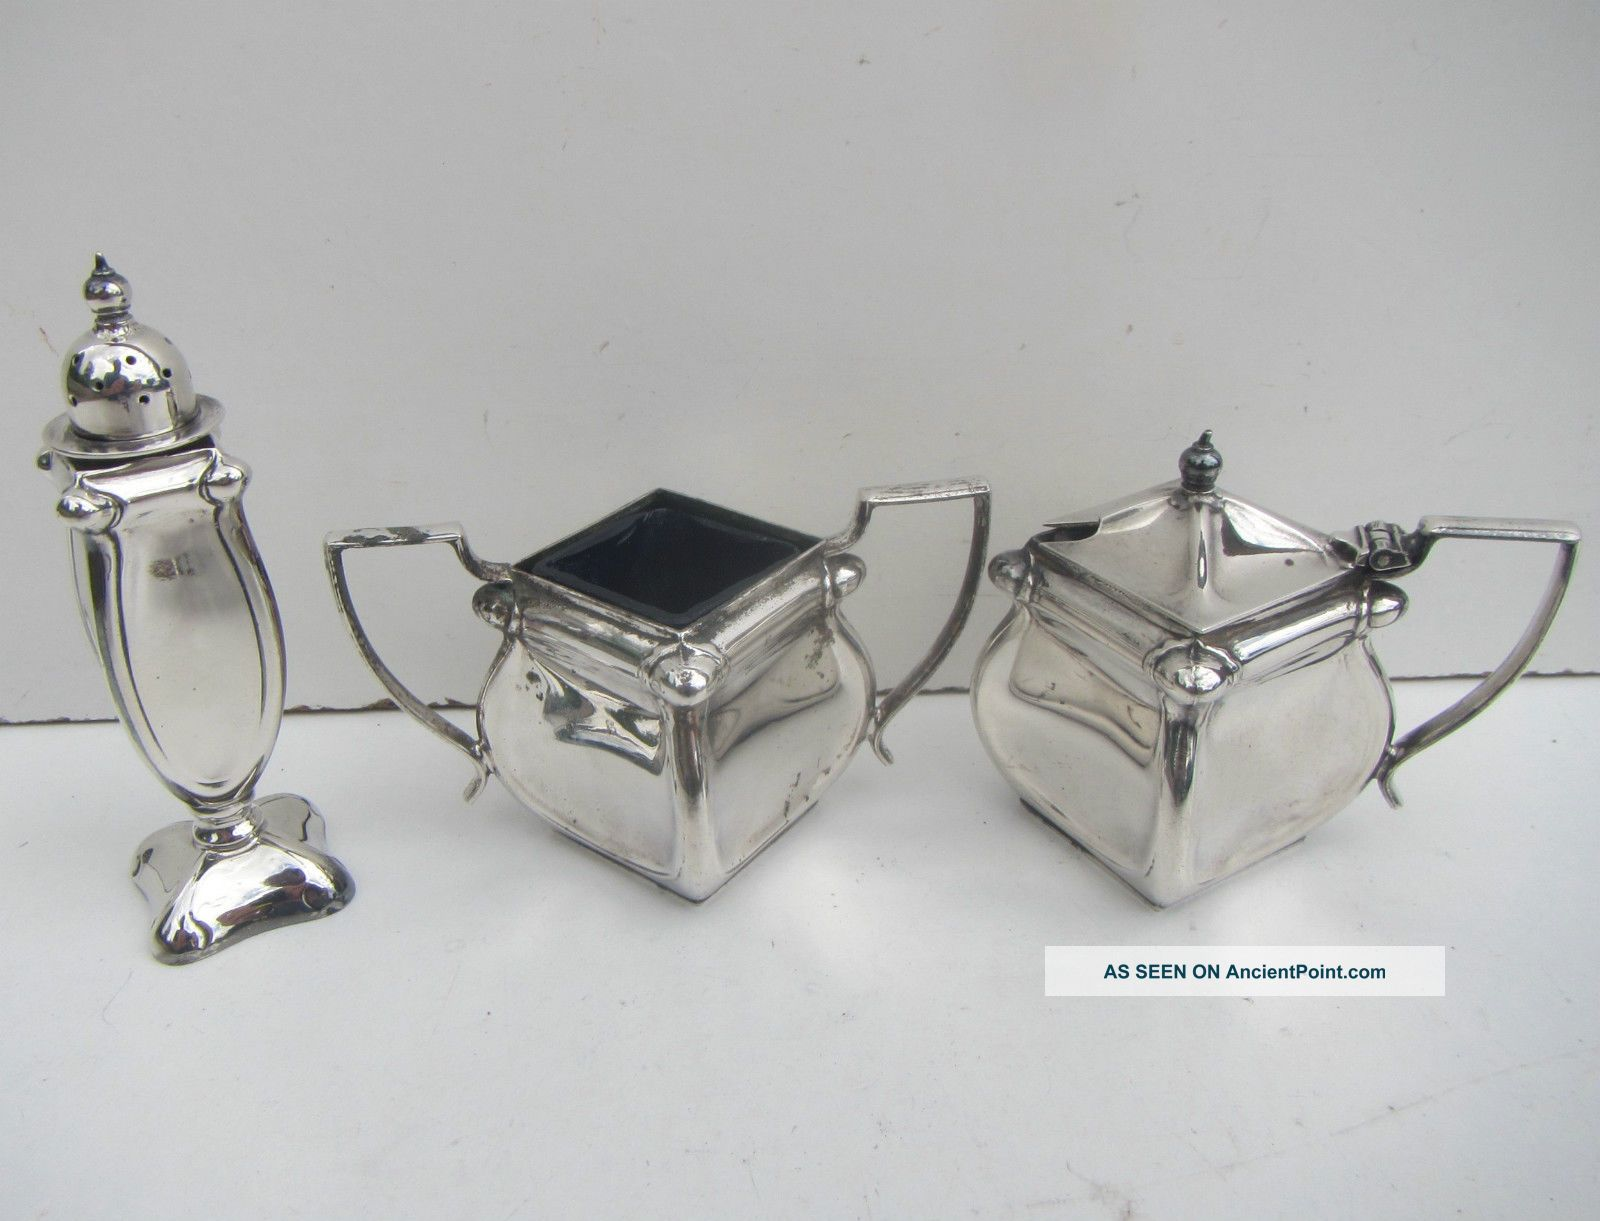 Vintage Silver Plate Salt Pot,  Pepper Shaker And Mustard Pot Salt & Pepper Cellars/Shakers photo